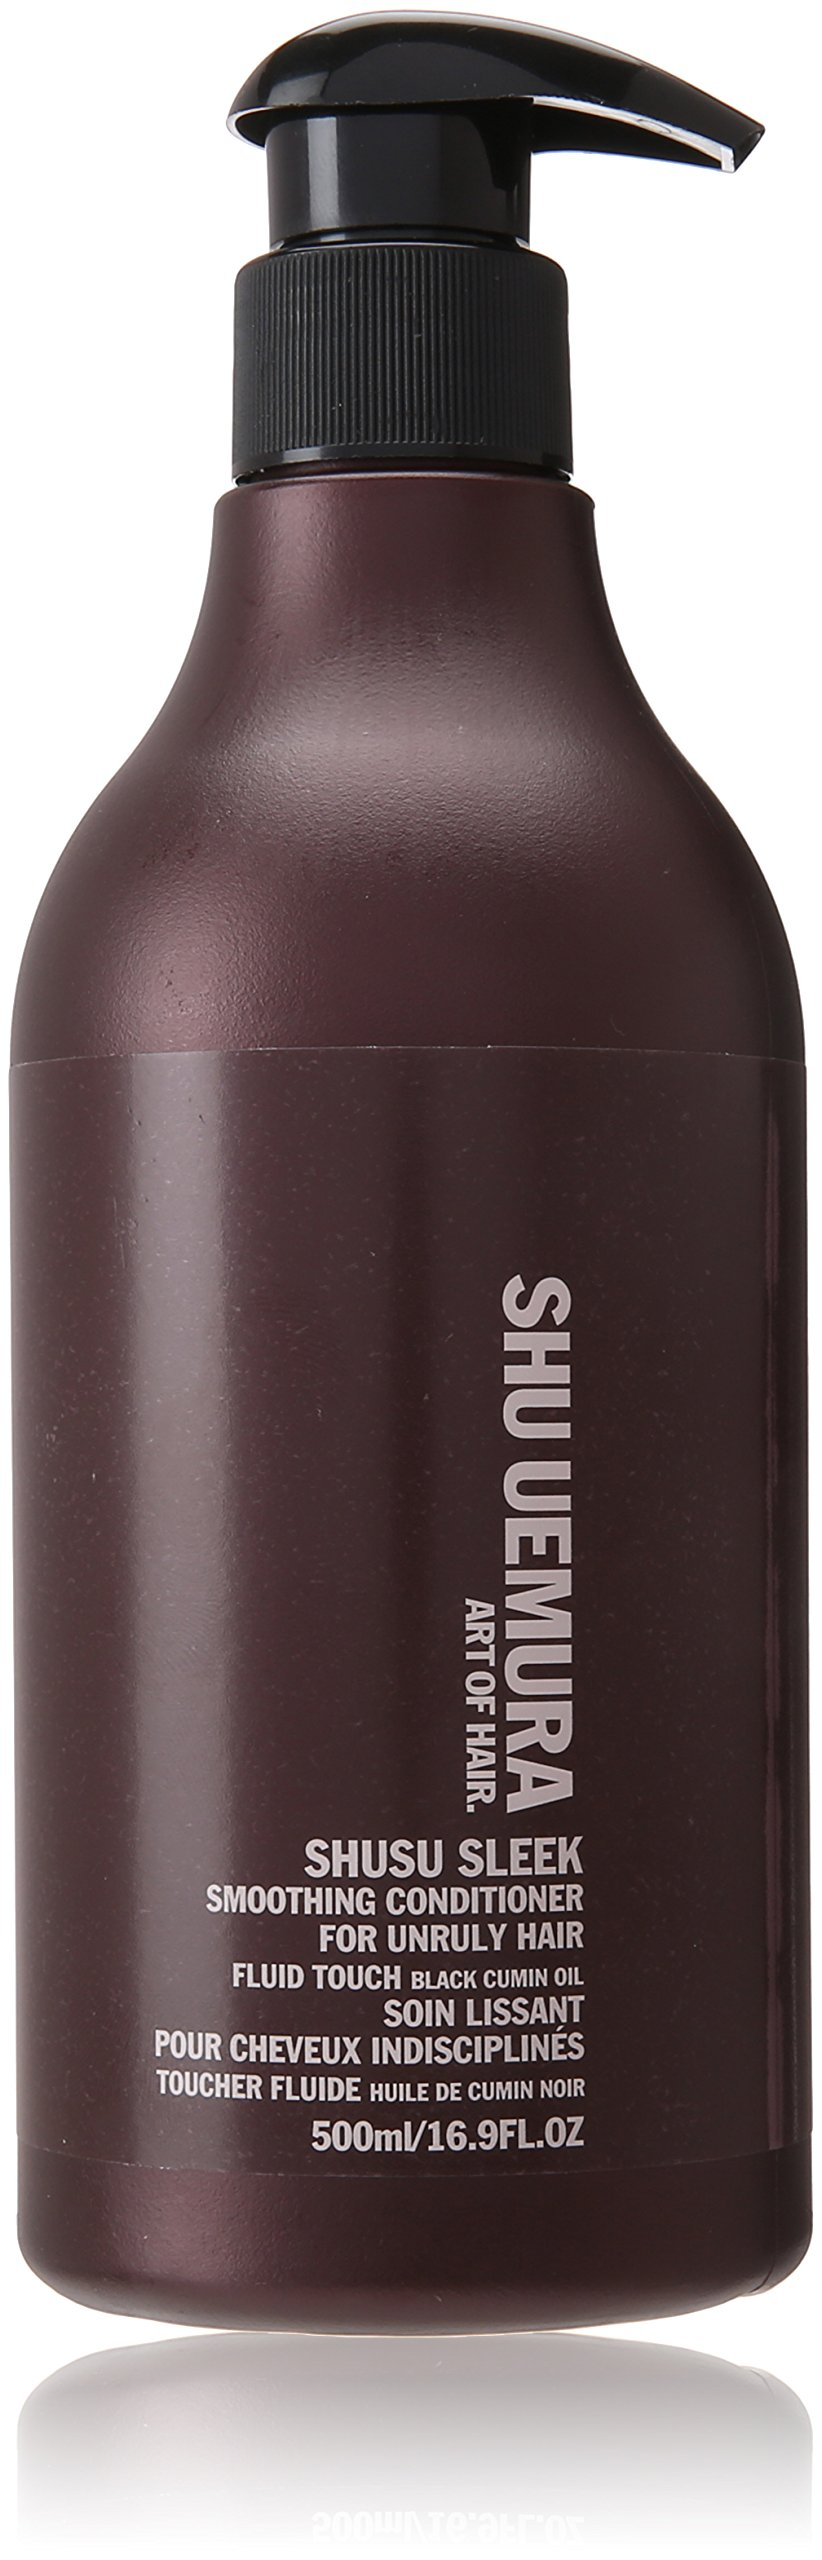 Shu Uemura Shusu Sleek Smoothing Conditioner for Unisex, 16.9 Ounce